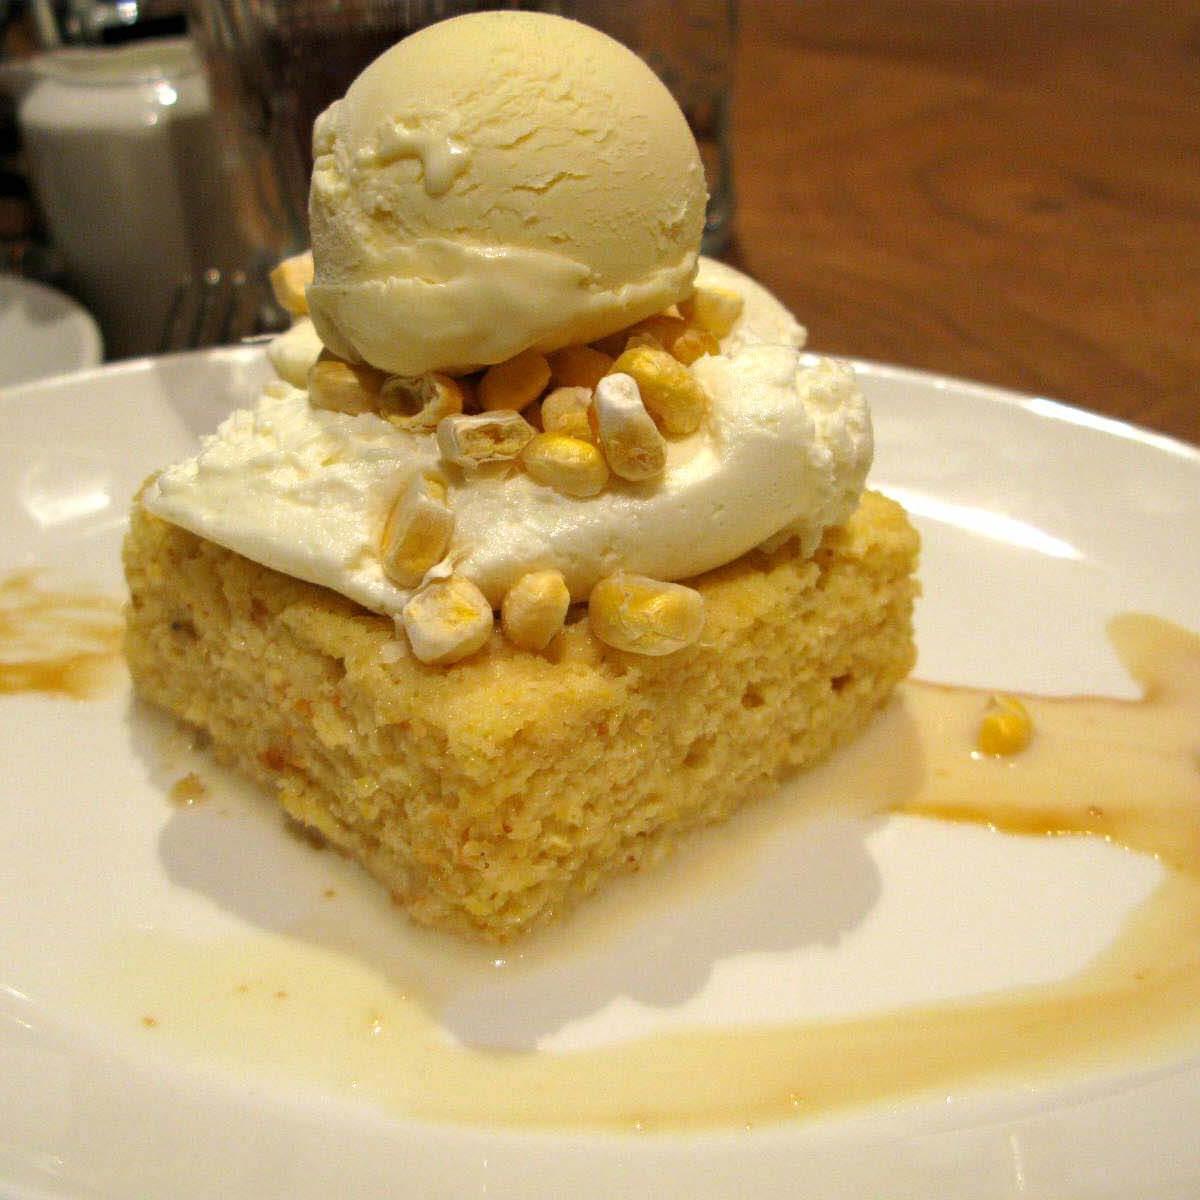 CBD Provisions, leches cake